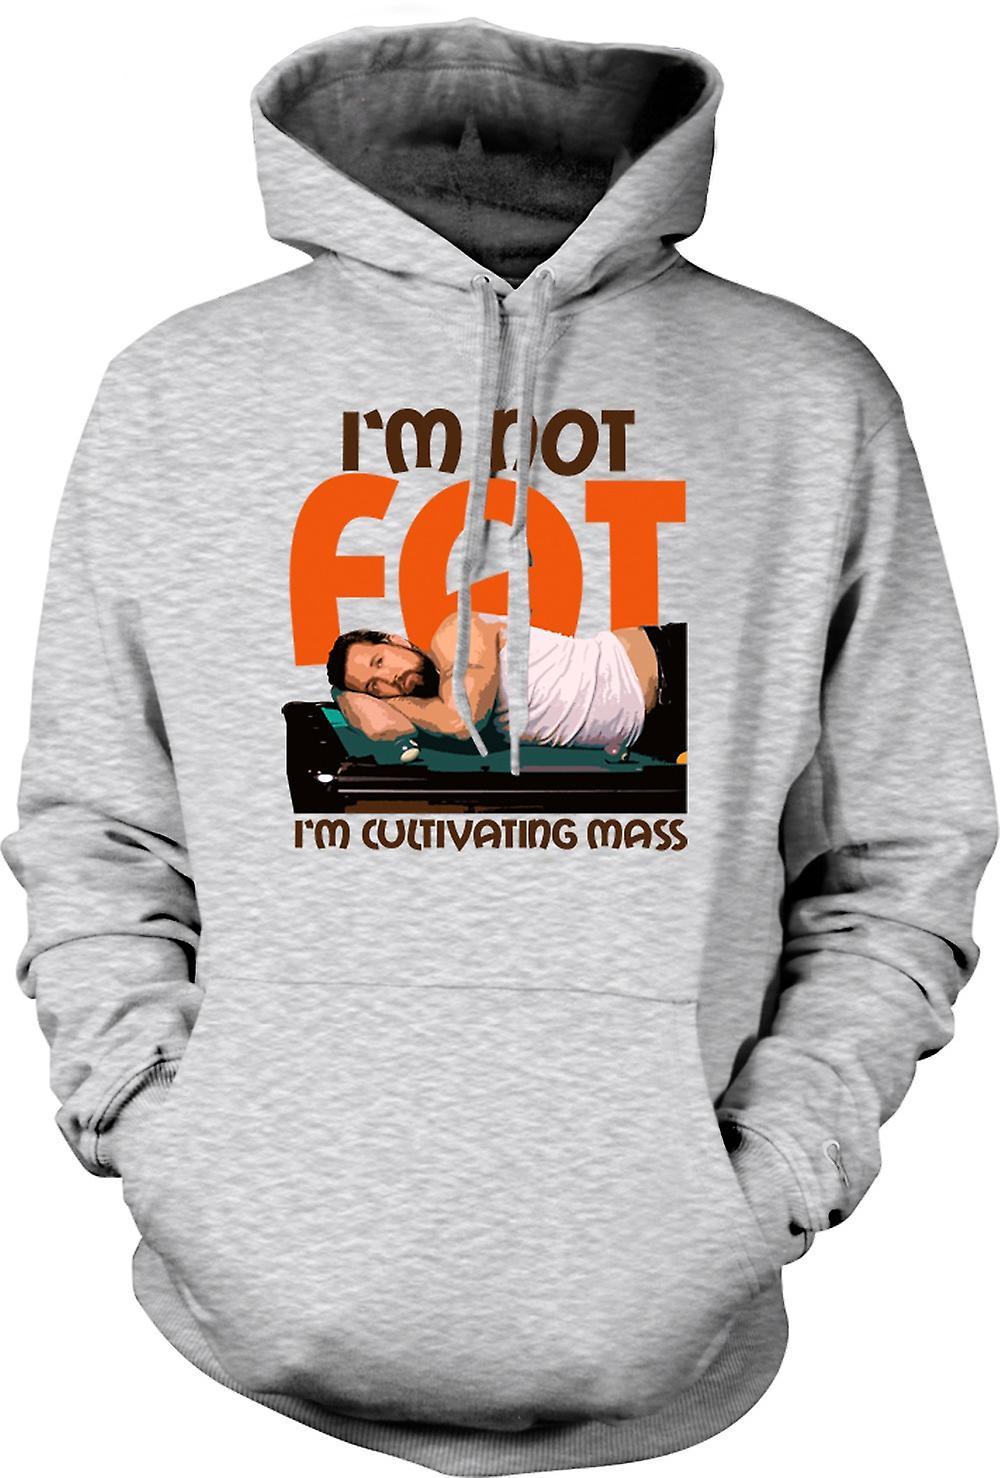 Mens Hoodie - Im Not Fat - Its Always Sunny In Philadelphia